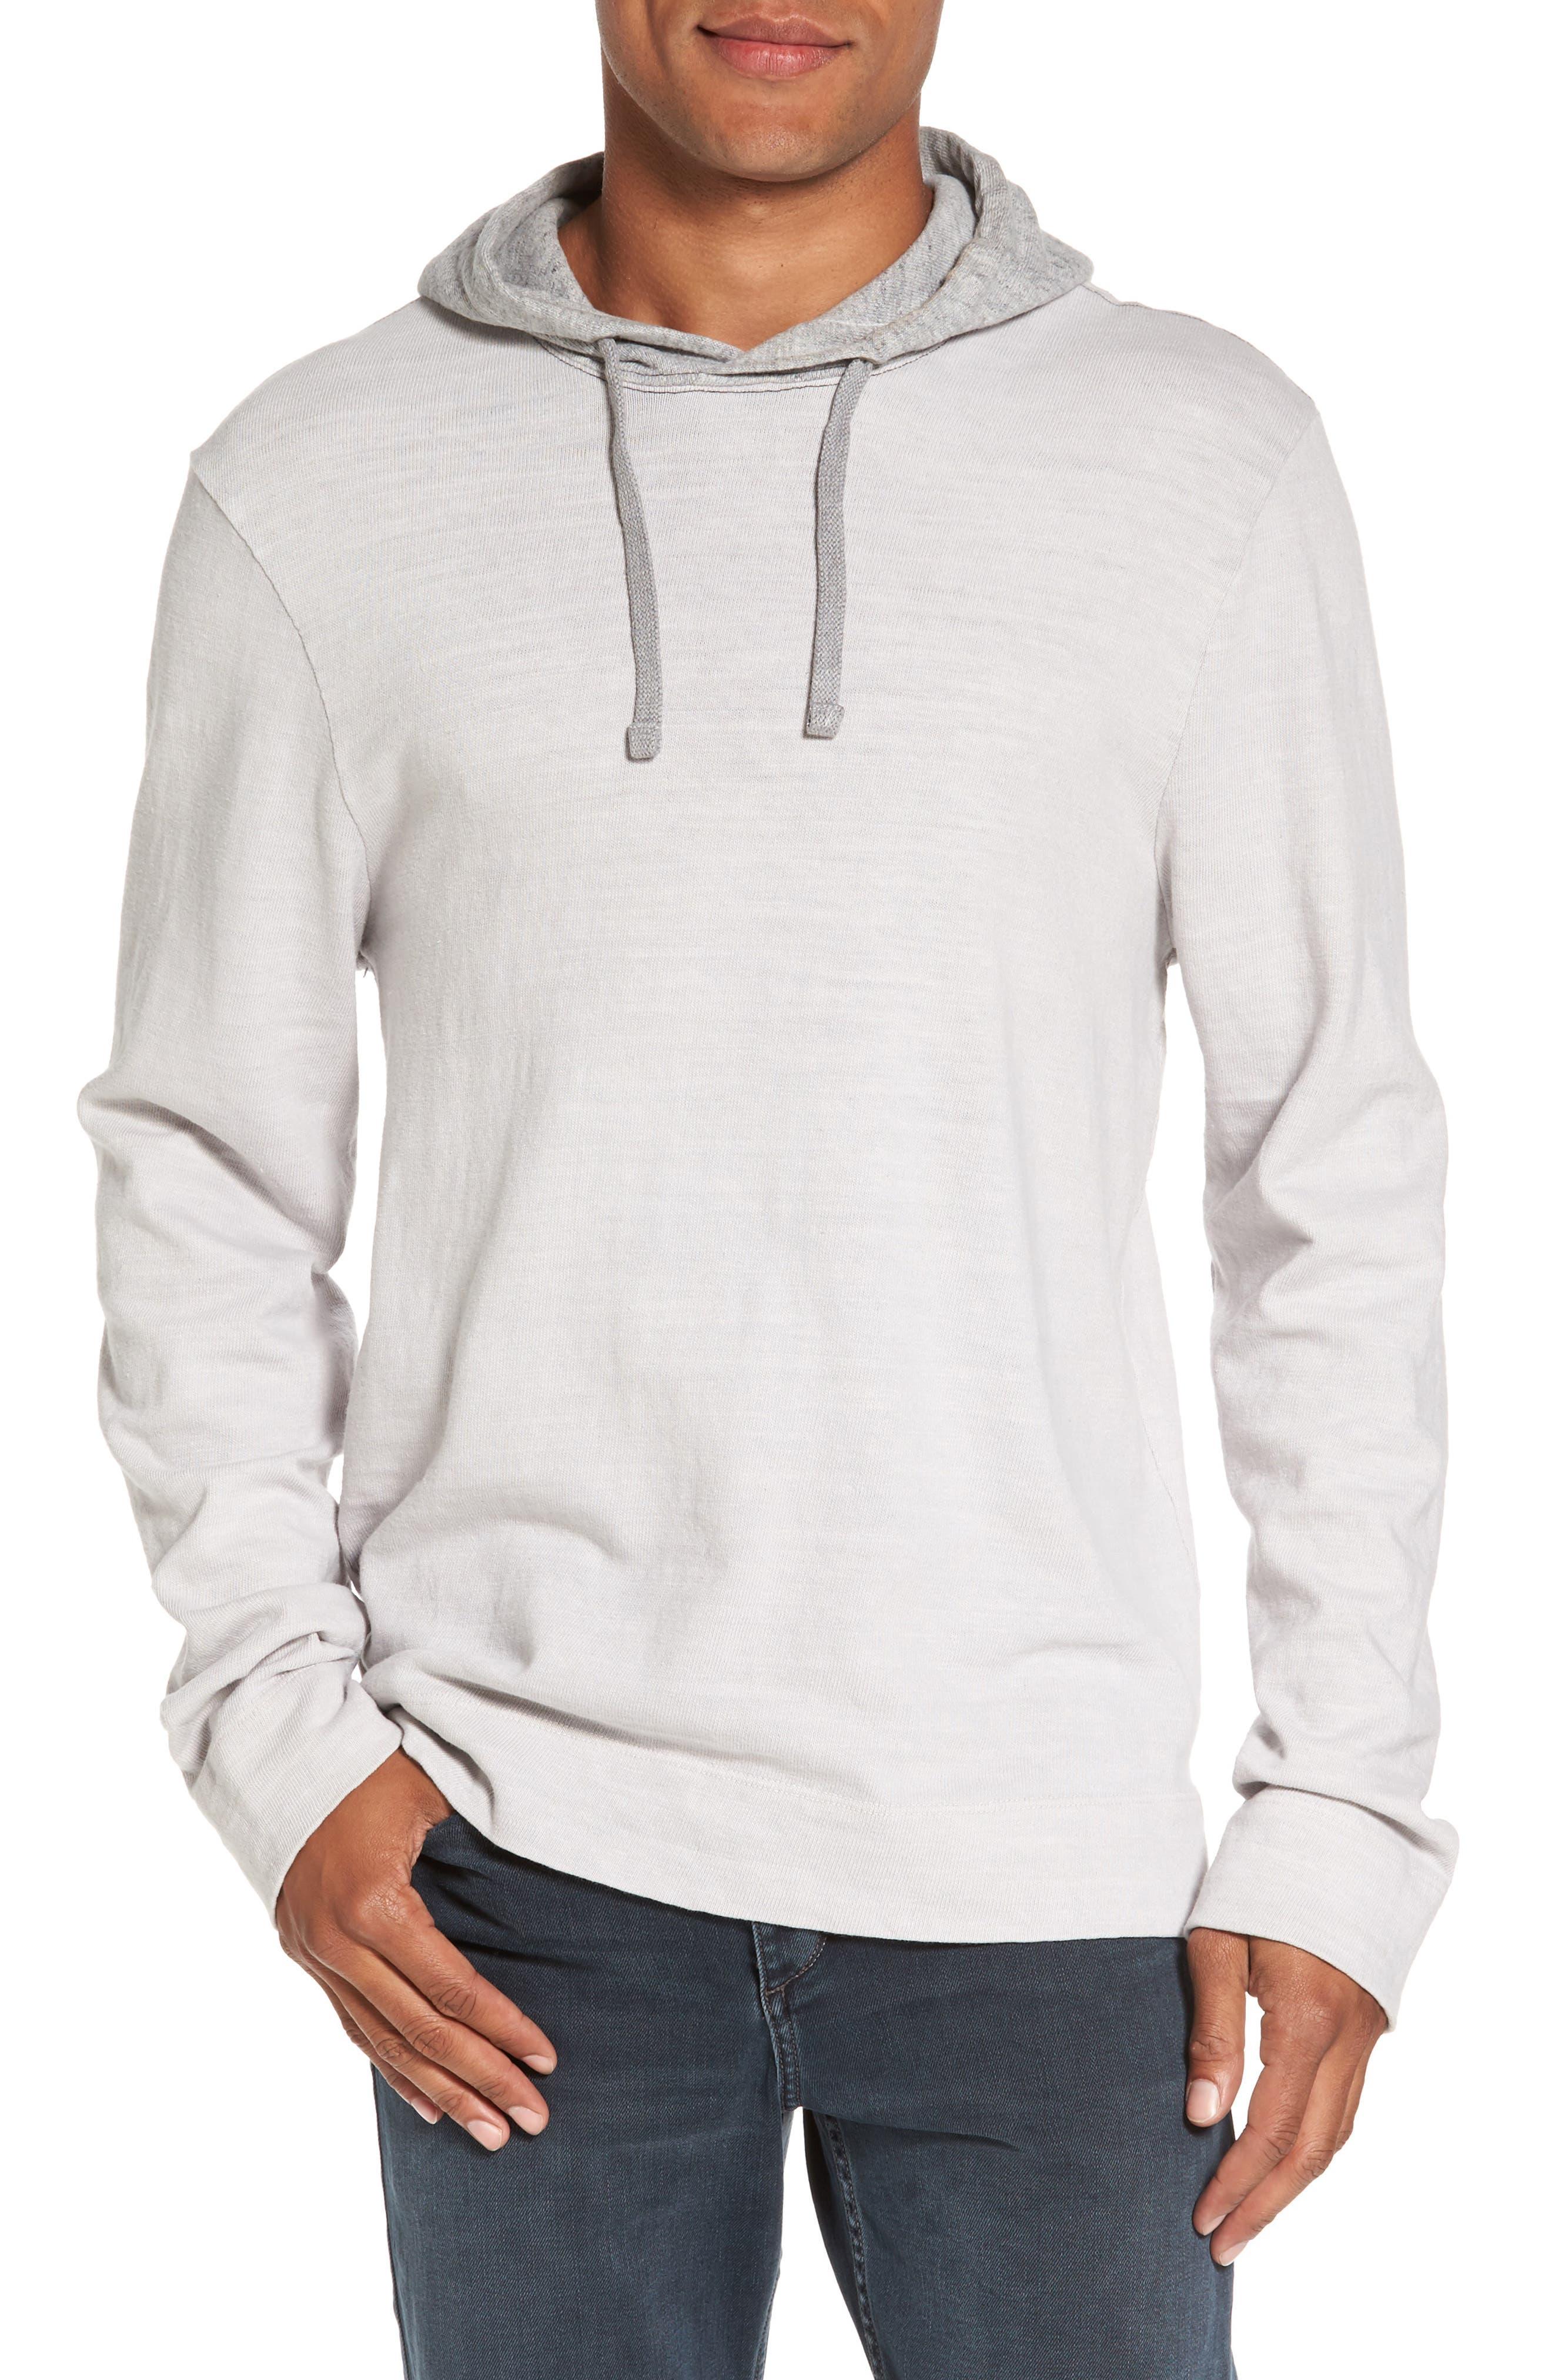 Standard Fit Pullover Hoodie,                         Main,                         color, Concrete Dust Pigment